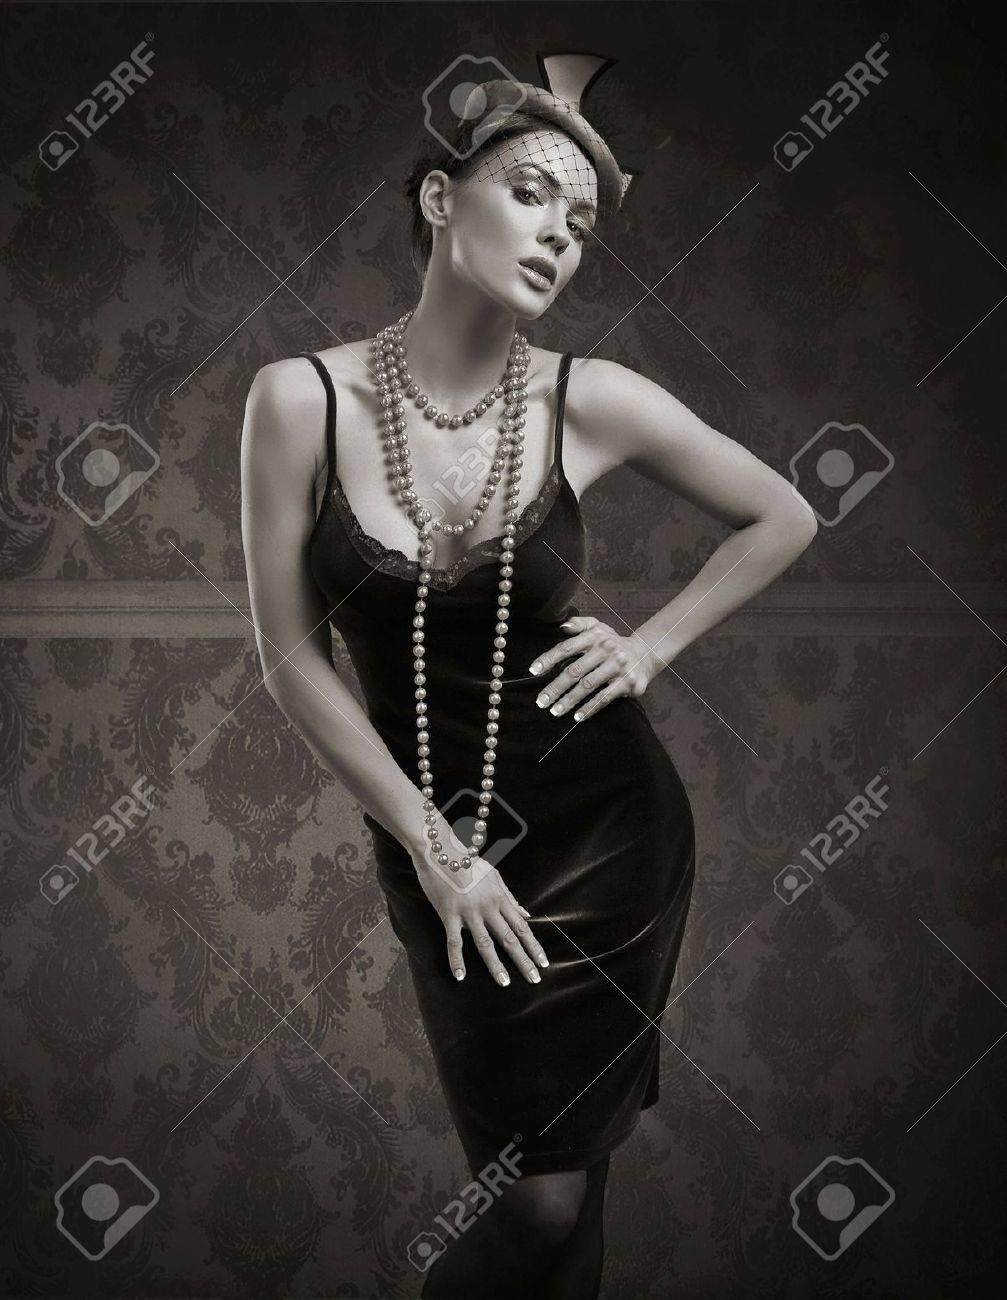 Vogue style vintage portrait in the dim light Stock Photo - 8254863